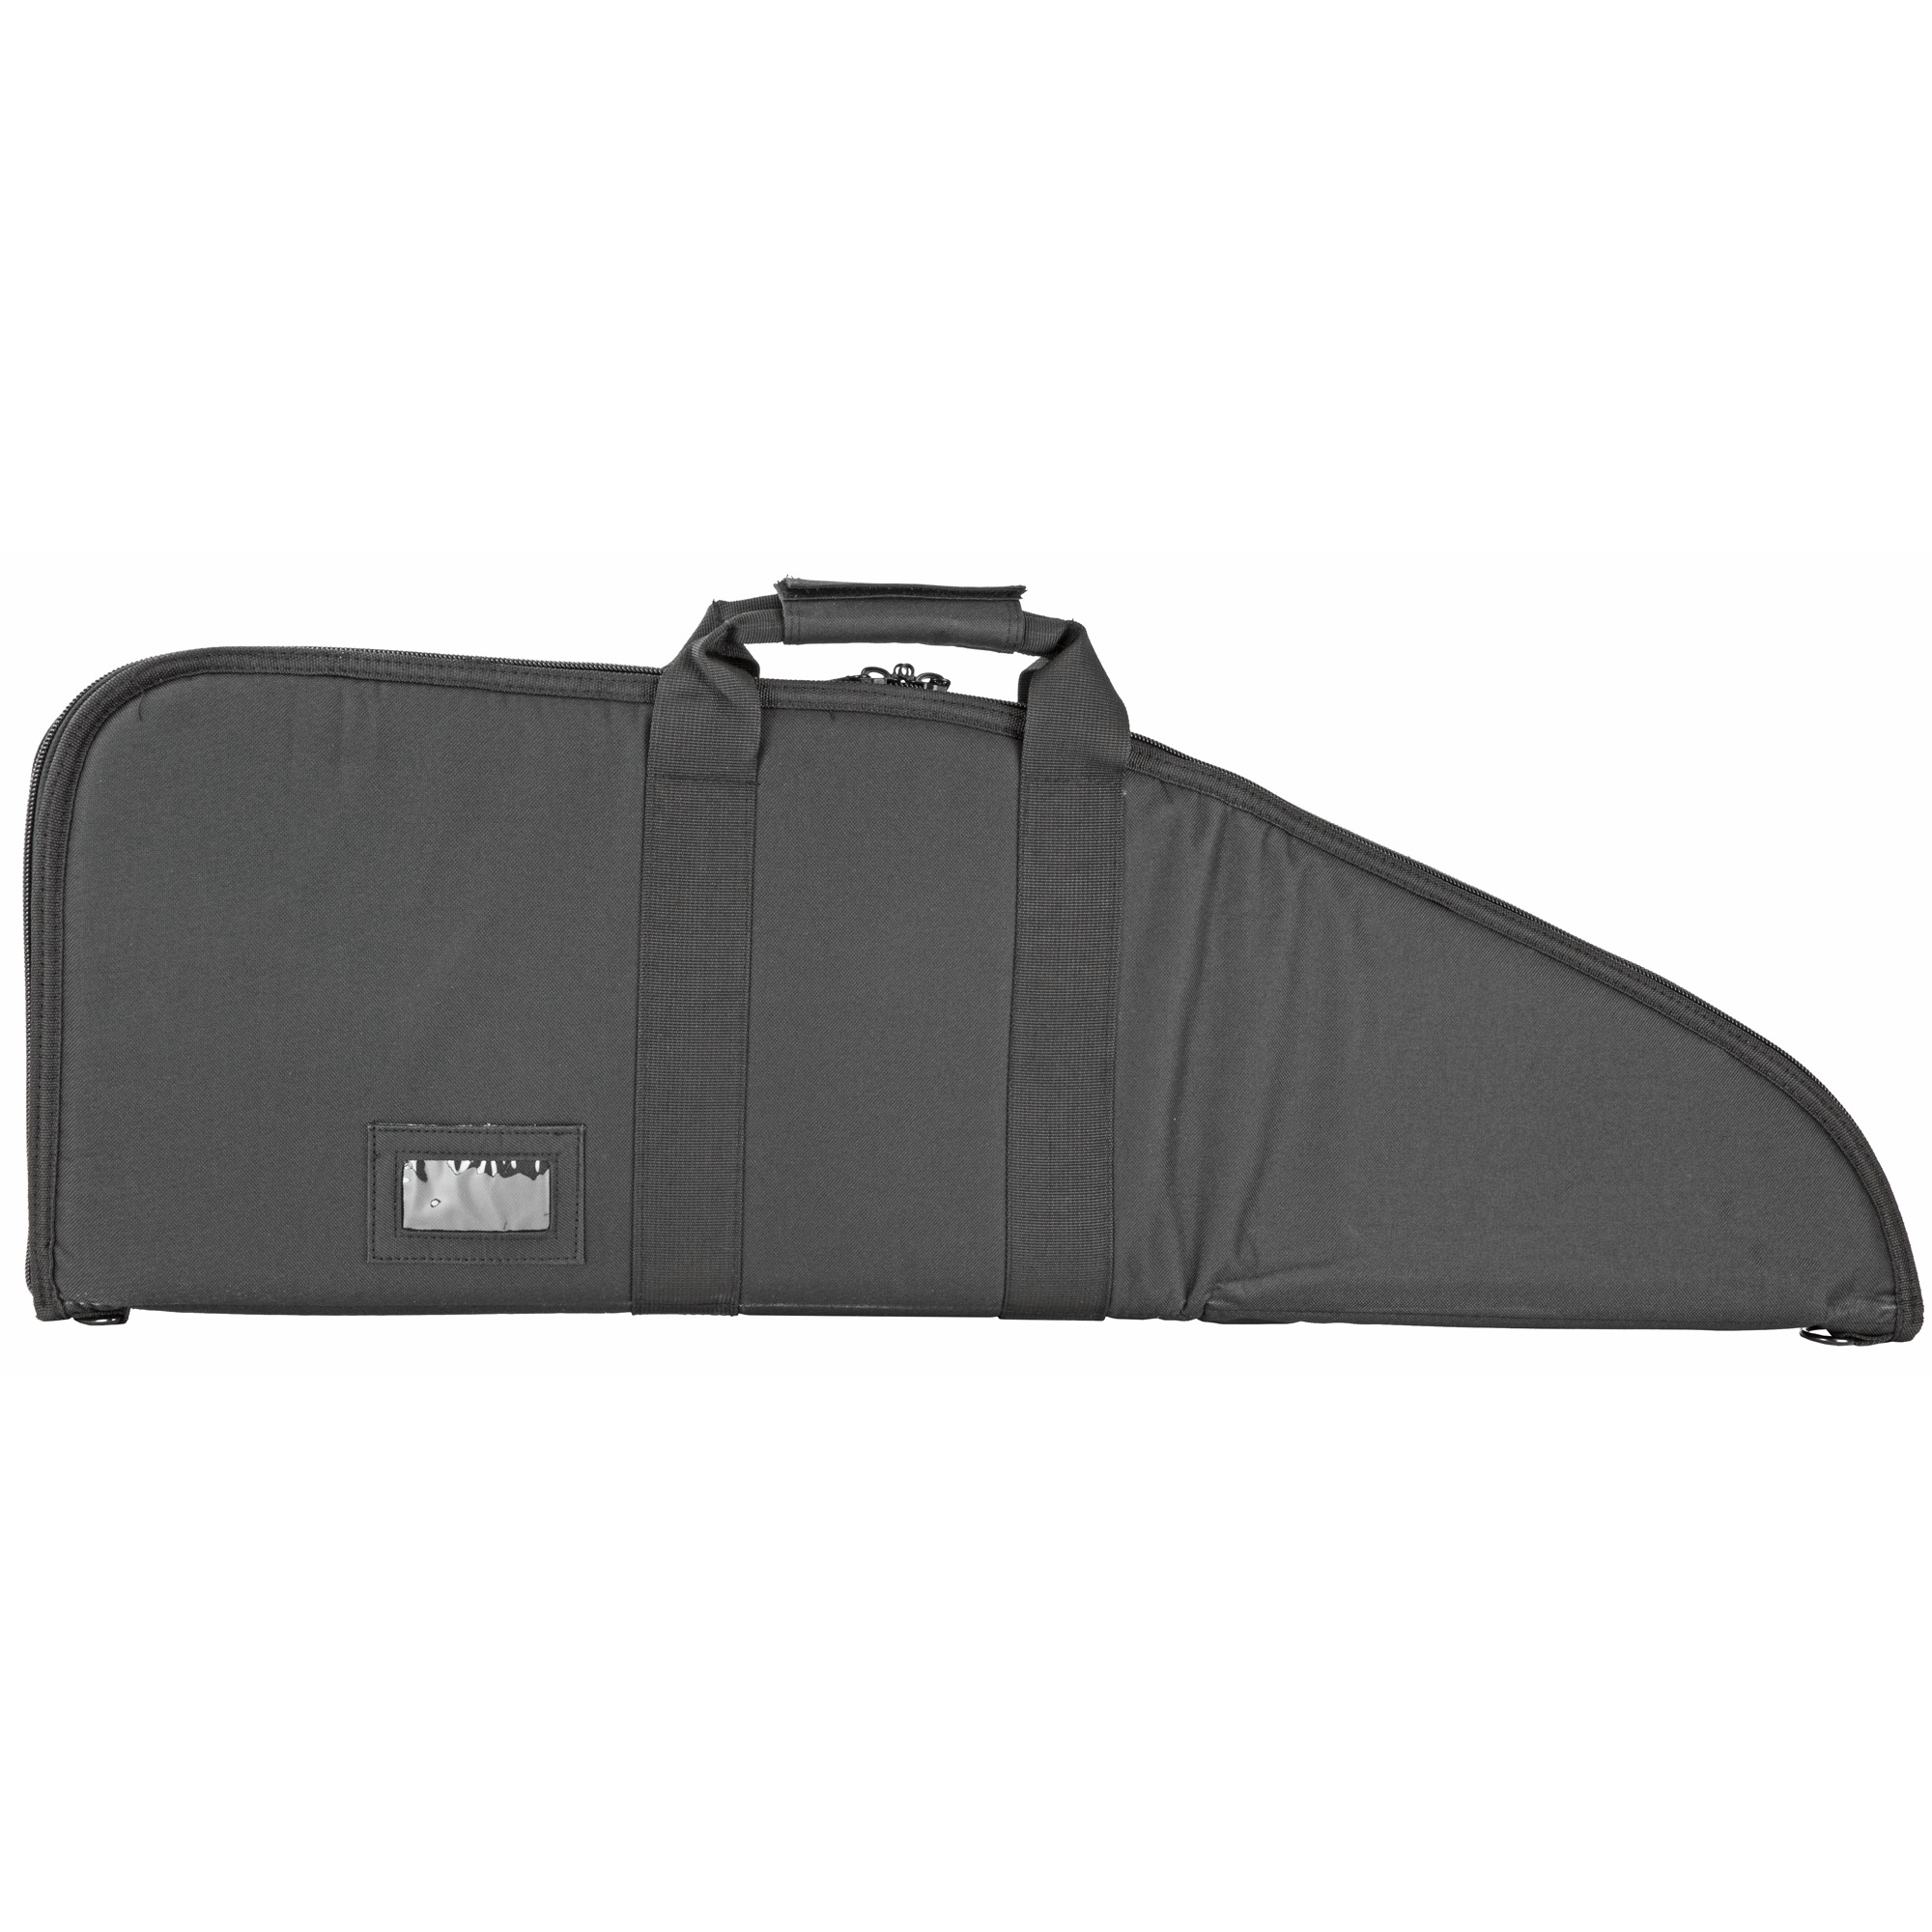 NCSTAR Rifle Case Nylon 36″ – Black